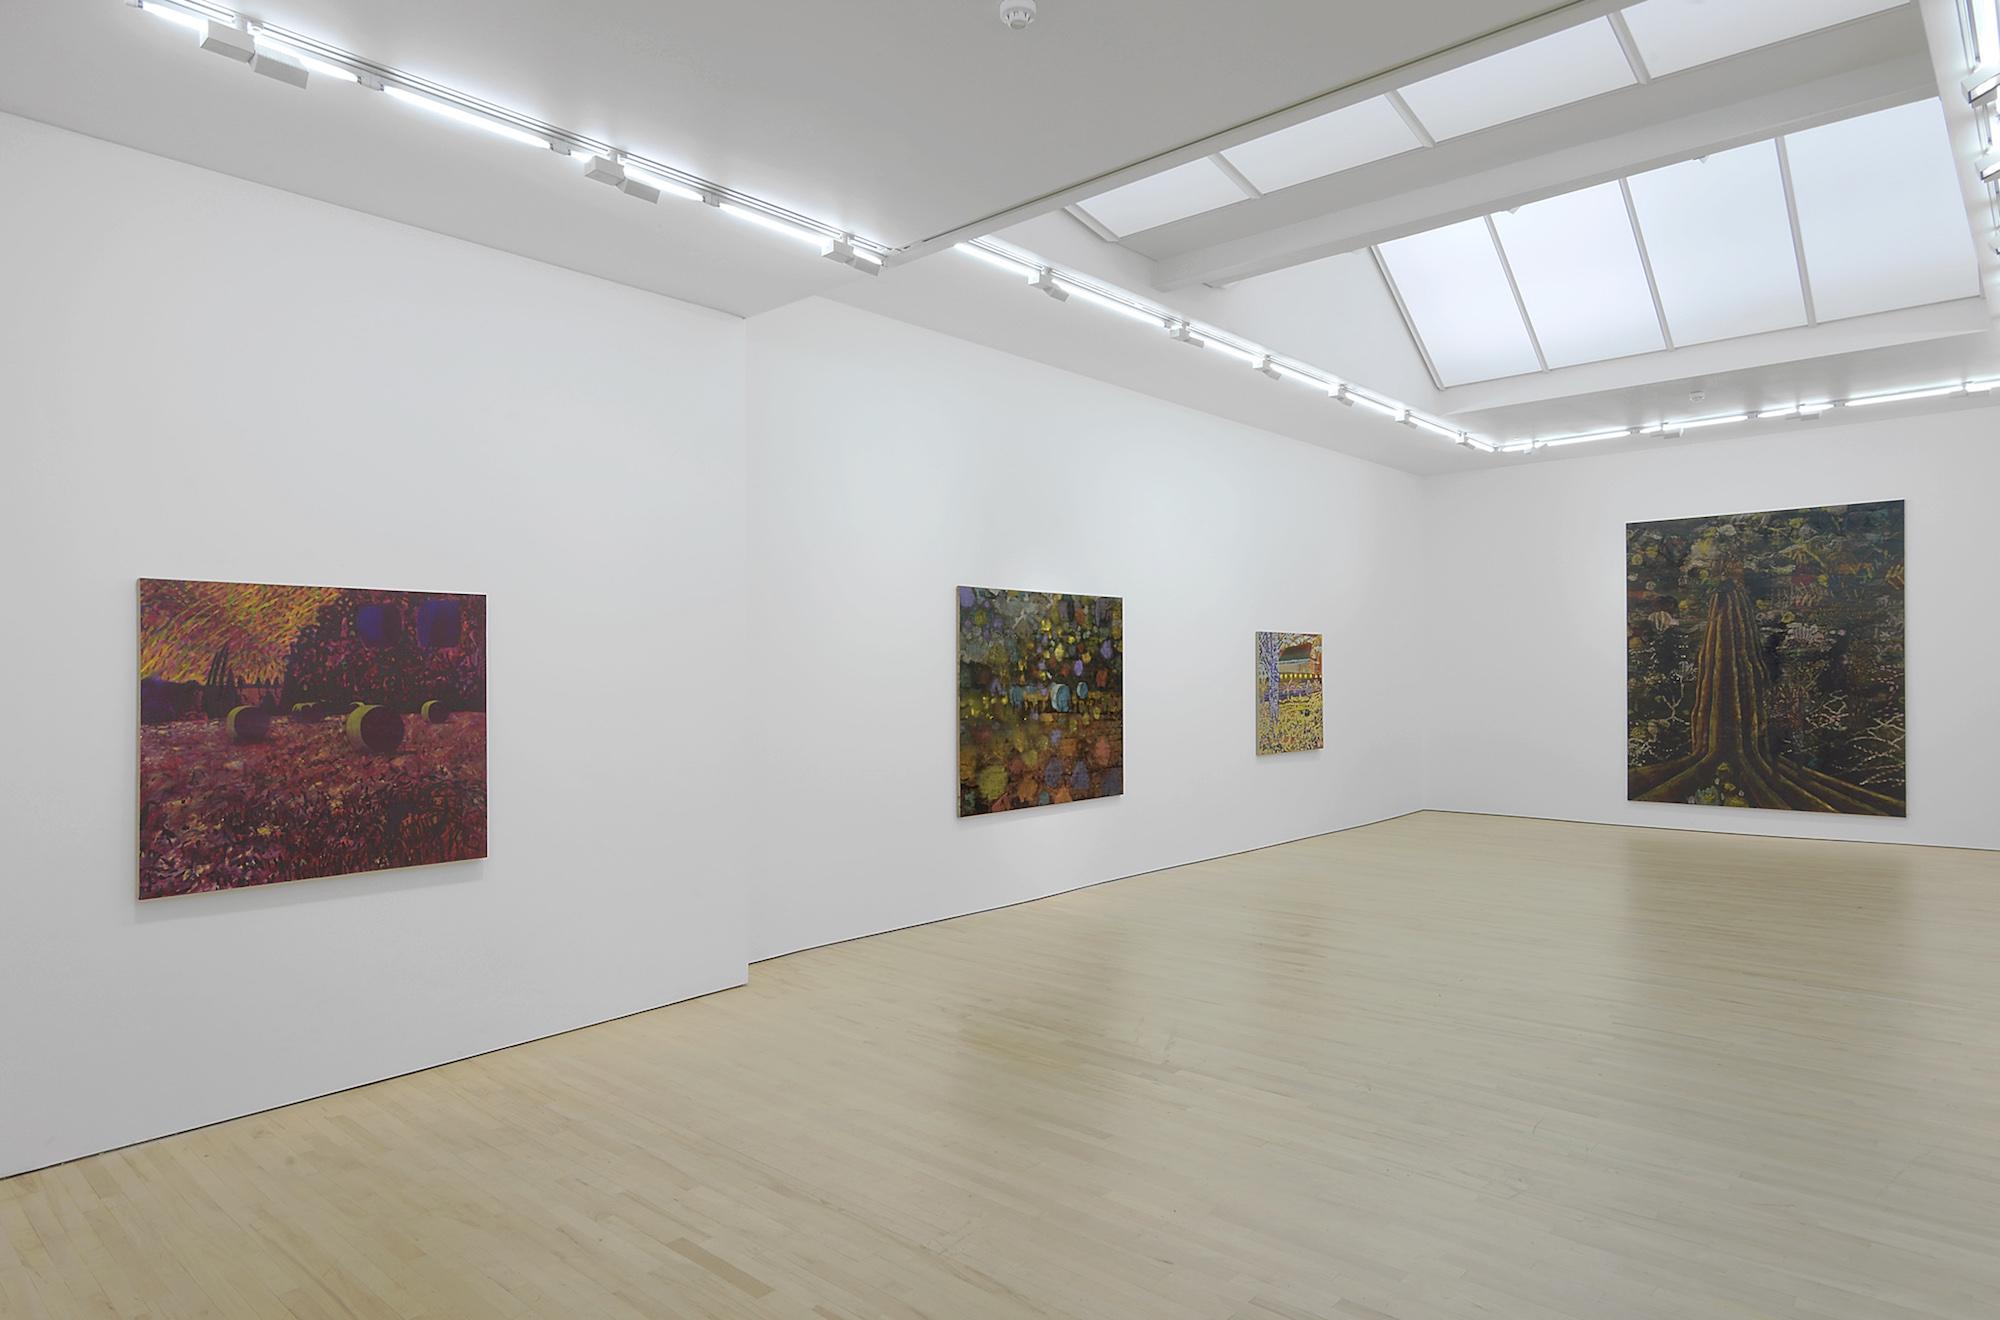 David Brian Smith @ Carl Freedman, London